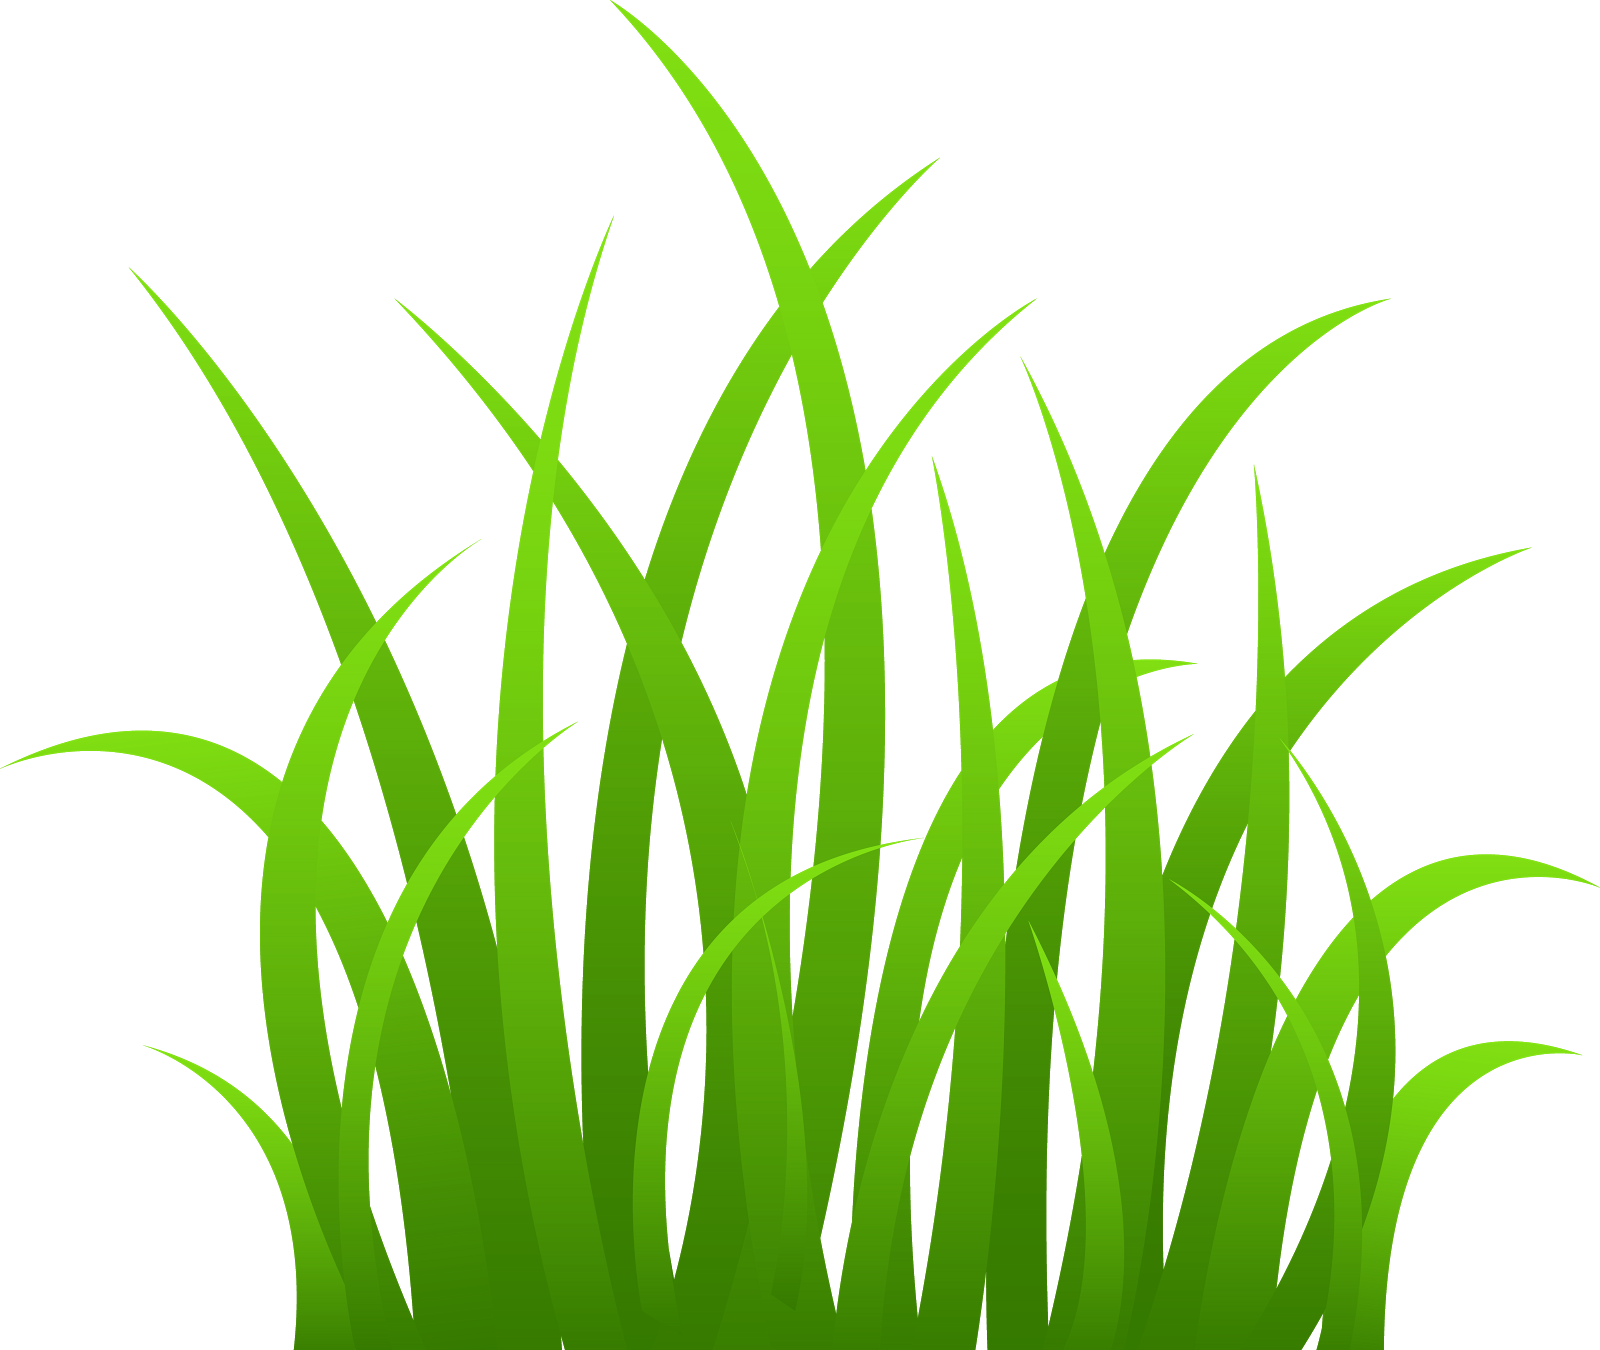 Grass Clipart Free Clip Art Images.